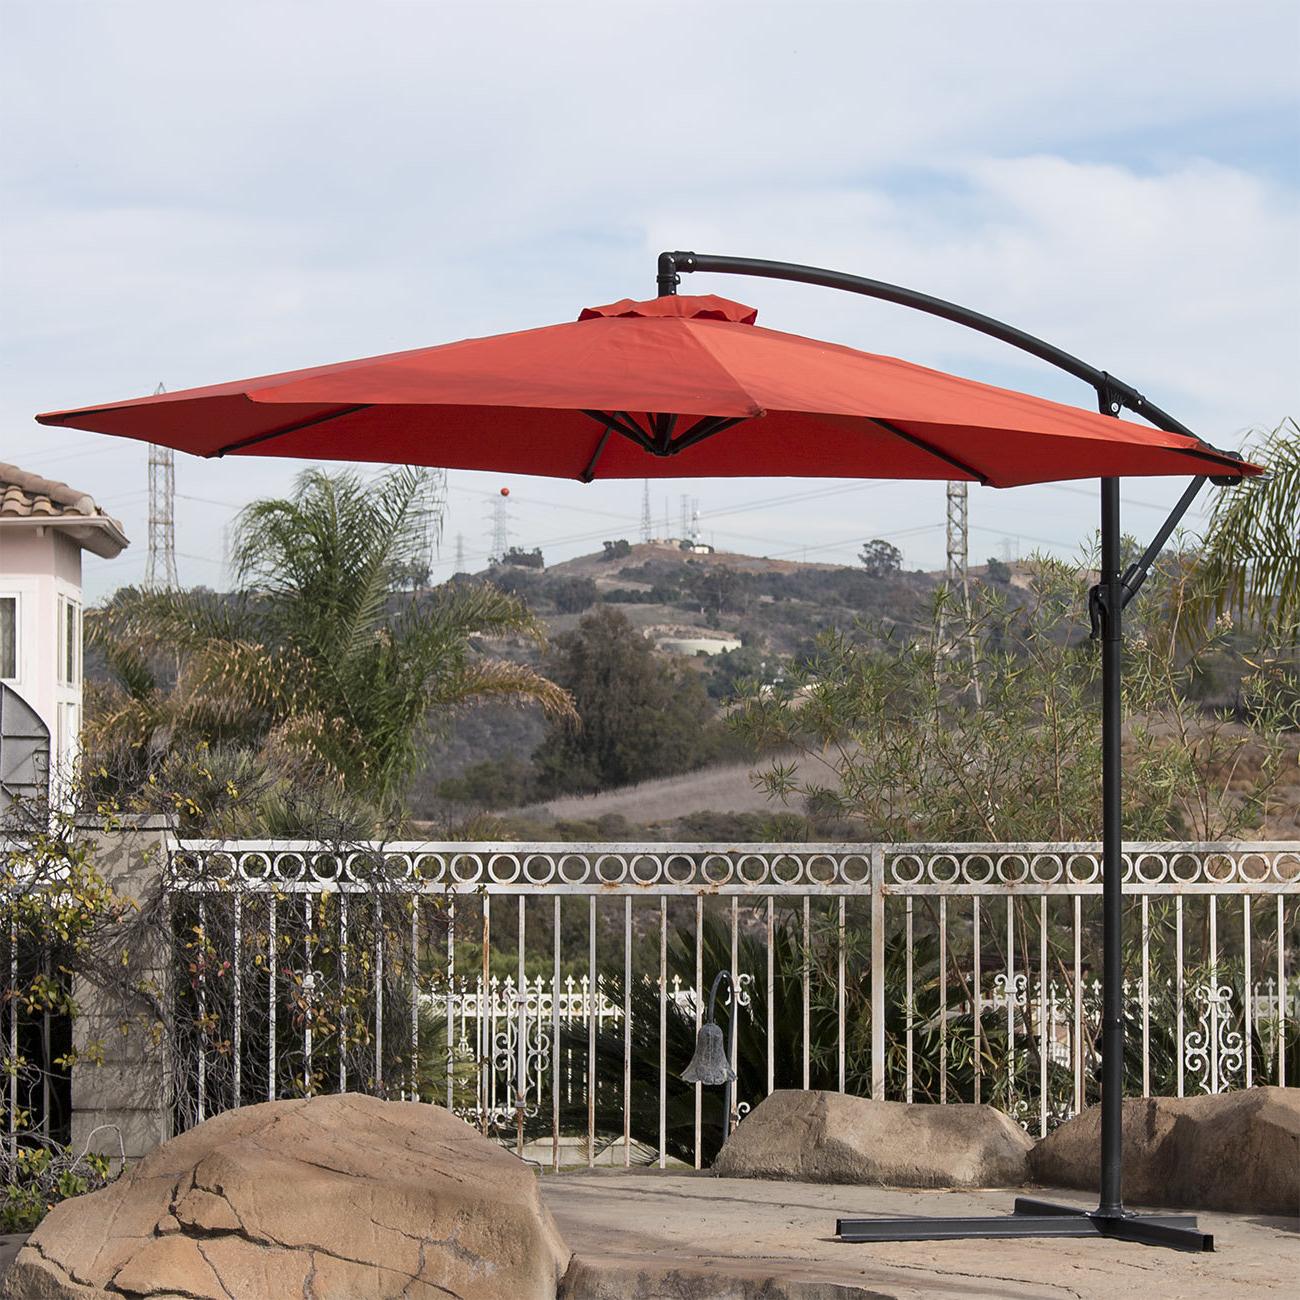 Andover Mills Bormann 10' Cantilever Umbrella Throughout Most Popular Bormann Cantilever Umbrellas (View 20 of 20)